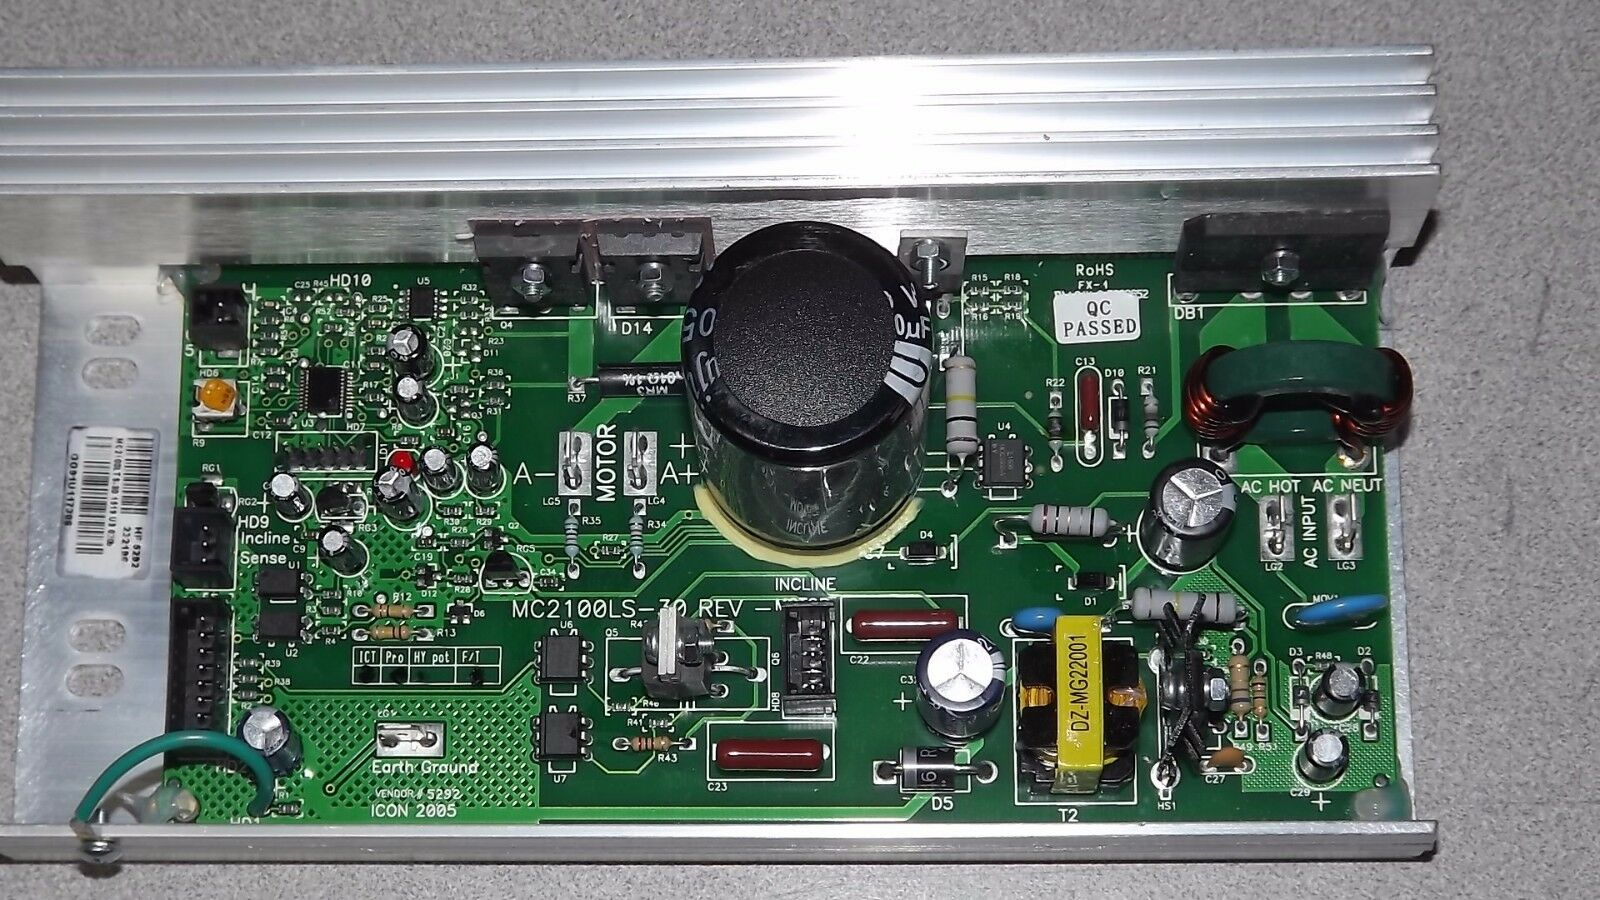 MC2100LTS-30 266333 ProForm NordicTrack GoldsGym Treadmill Motor Controller